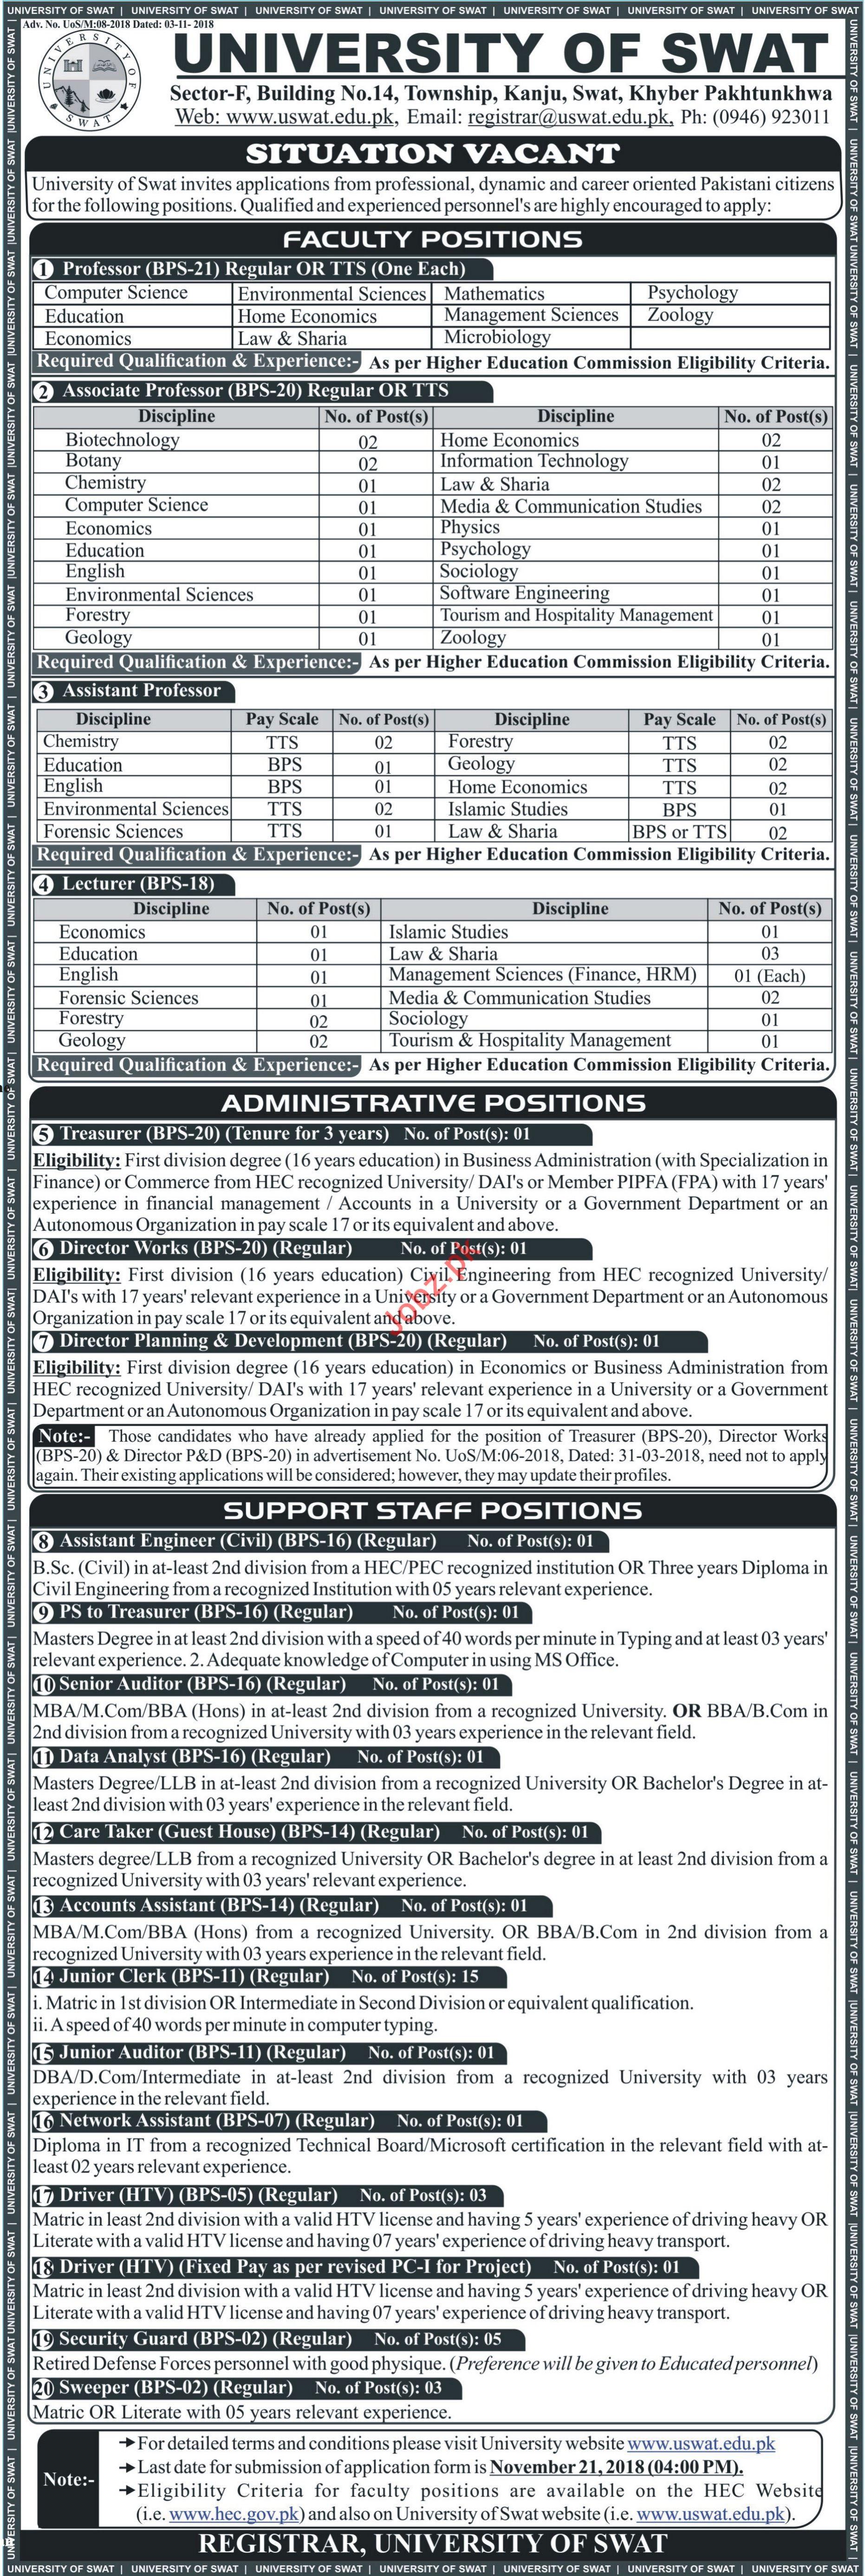 University of Swat KPK Jobs 2018